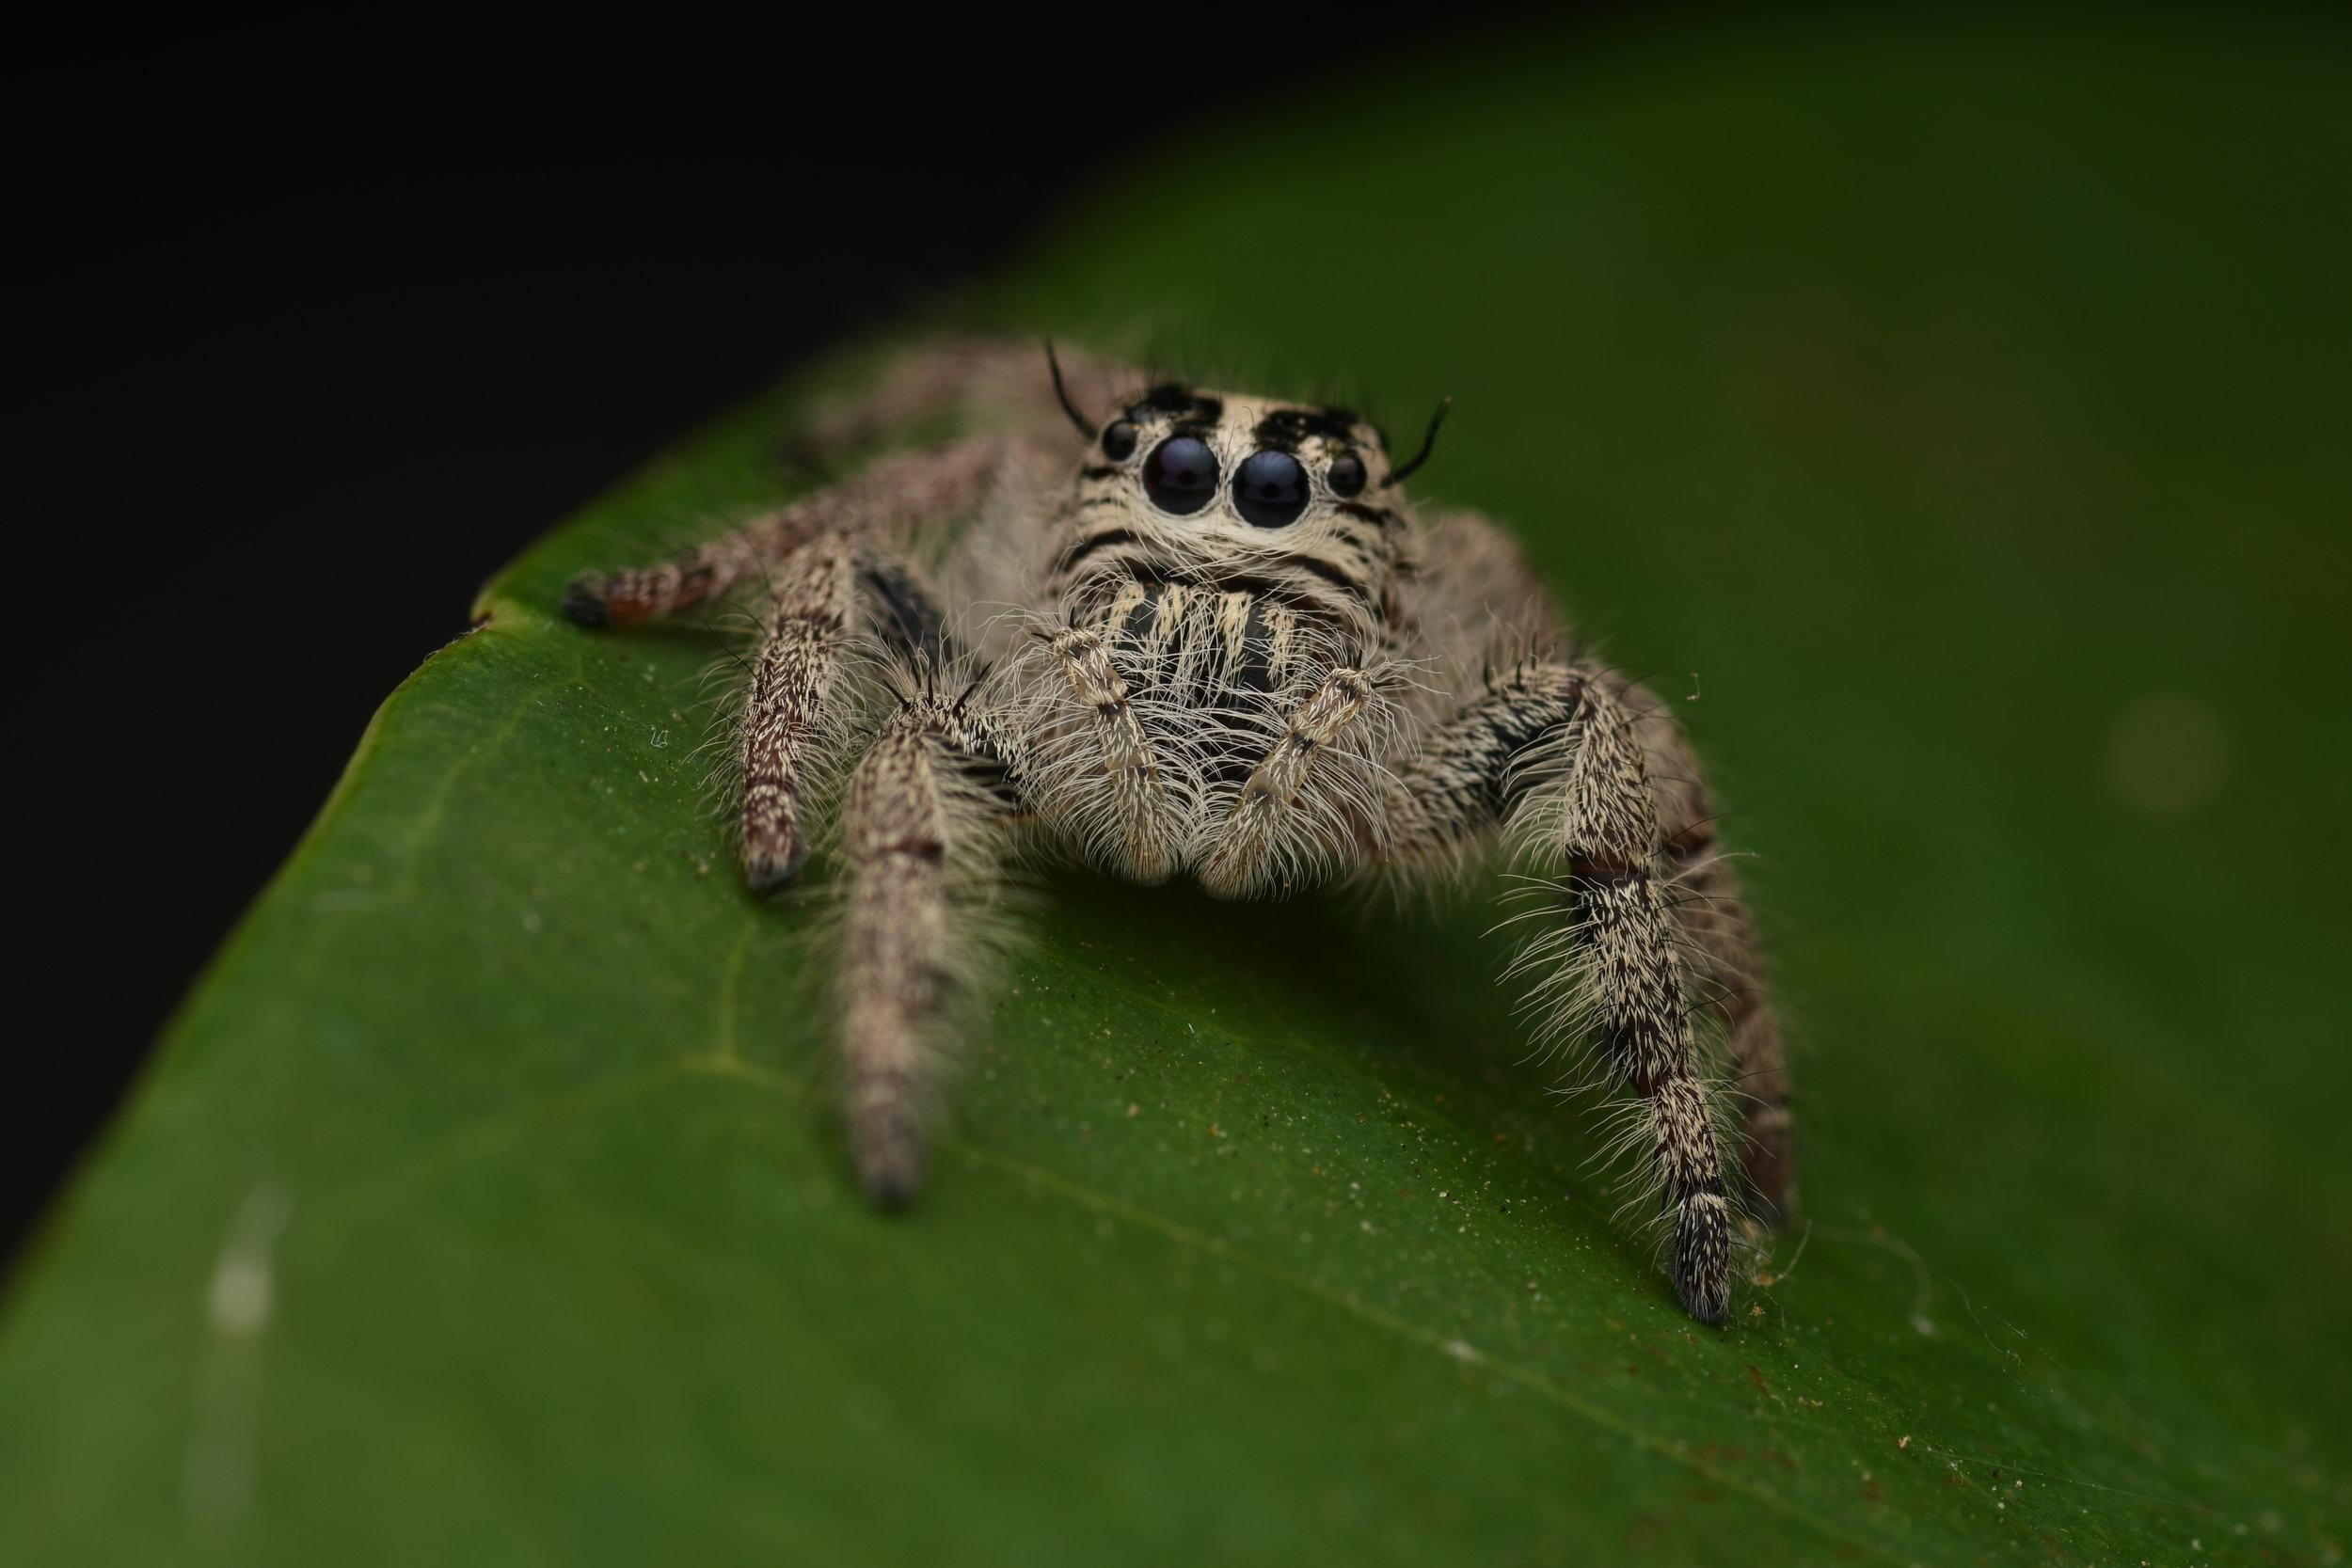 Heavy Jumping Spider ( Hyllus diardi ),   Tanjung Rhu, Langkawi Island, Malaysia  • Nikon D500, Tokina 100mm f/2,8 macro, Nikon SB900 @ 1/16 power with Alex Goh Macro Diffuser, ISO100, f/18, 1/250s